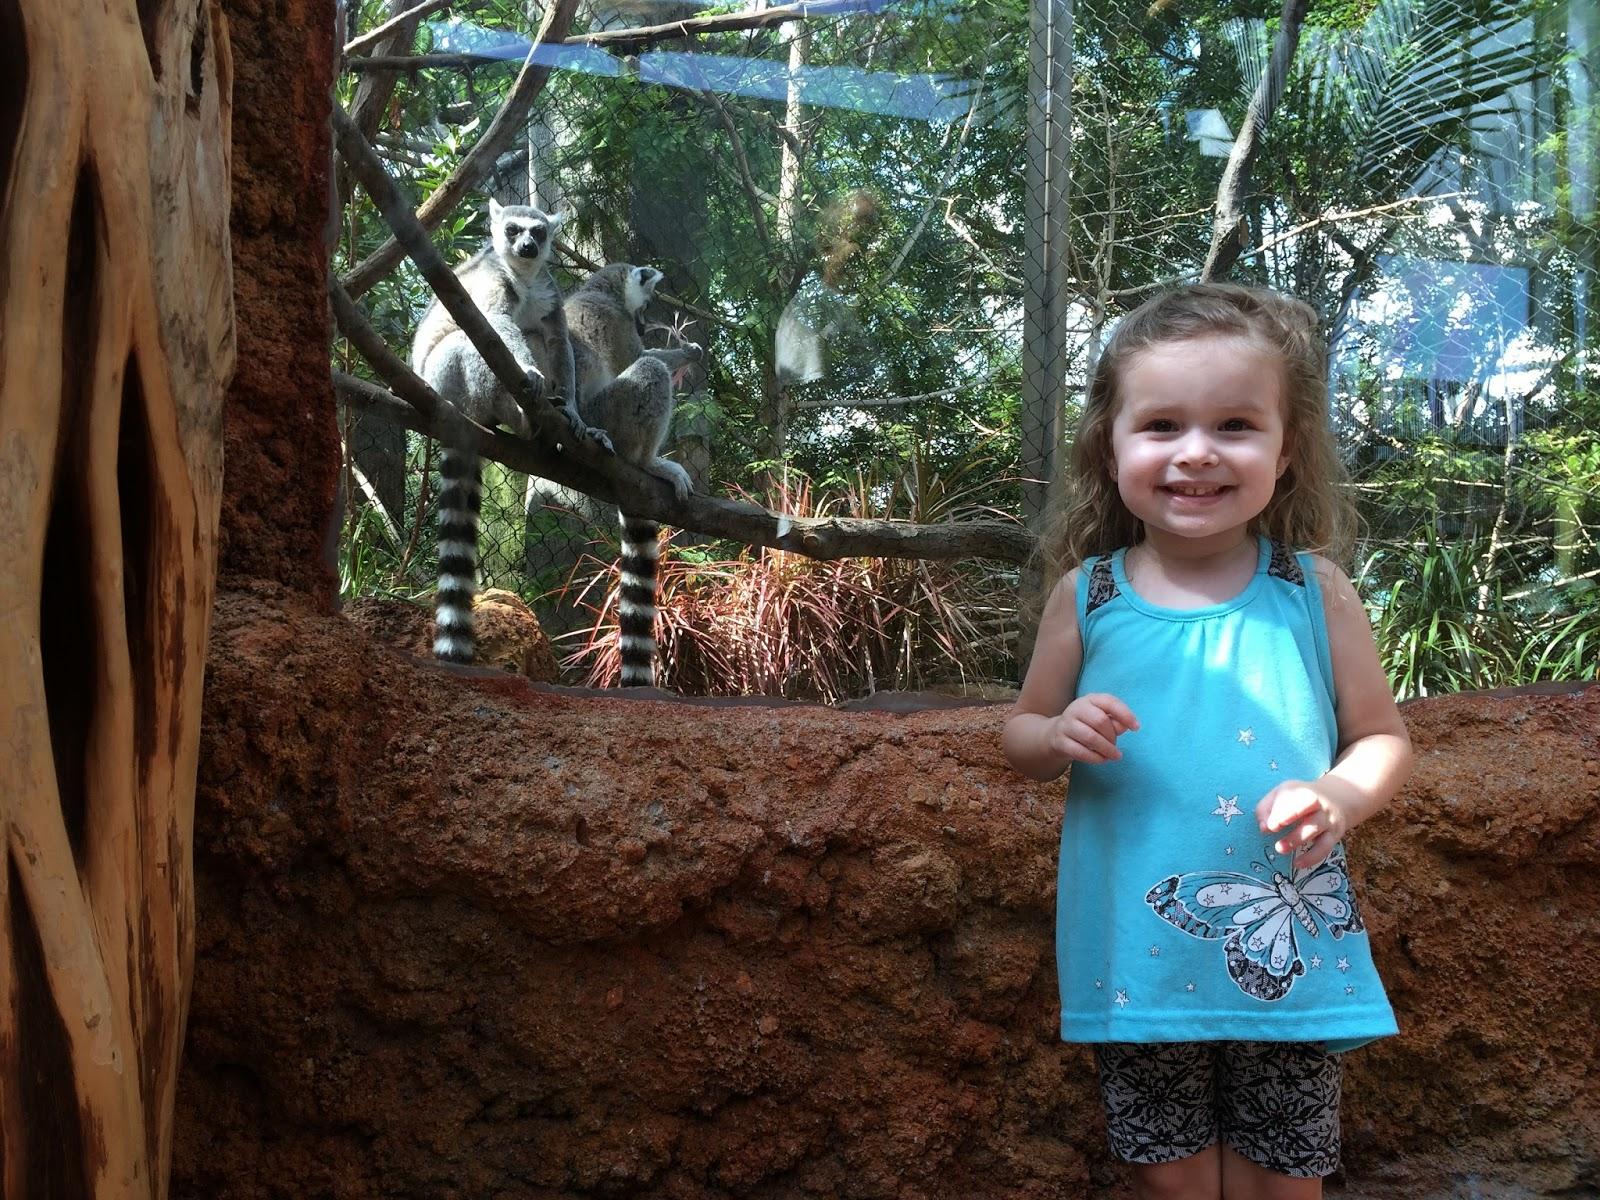 #ivysvariety Lemurs at The Florida Aquarium Tampa